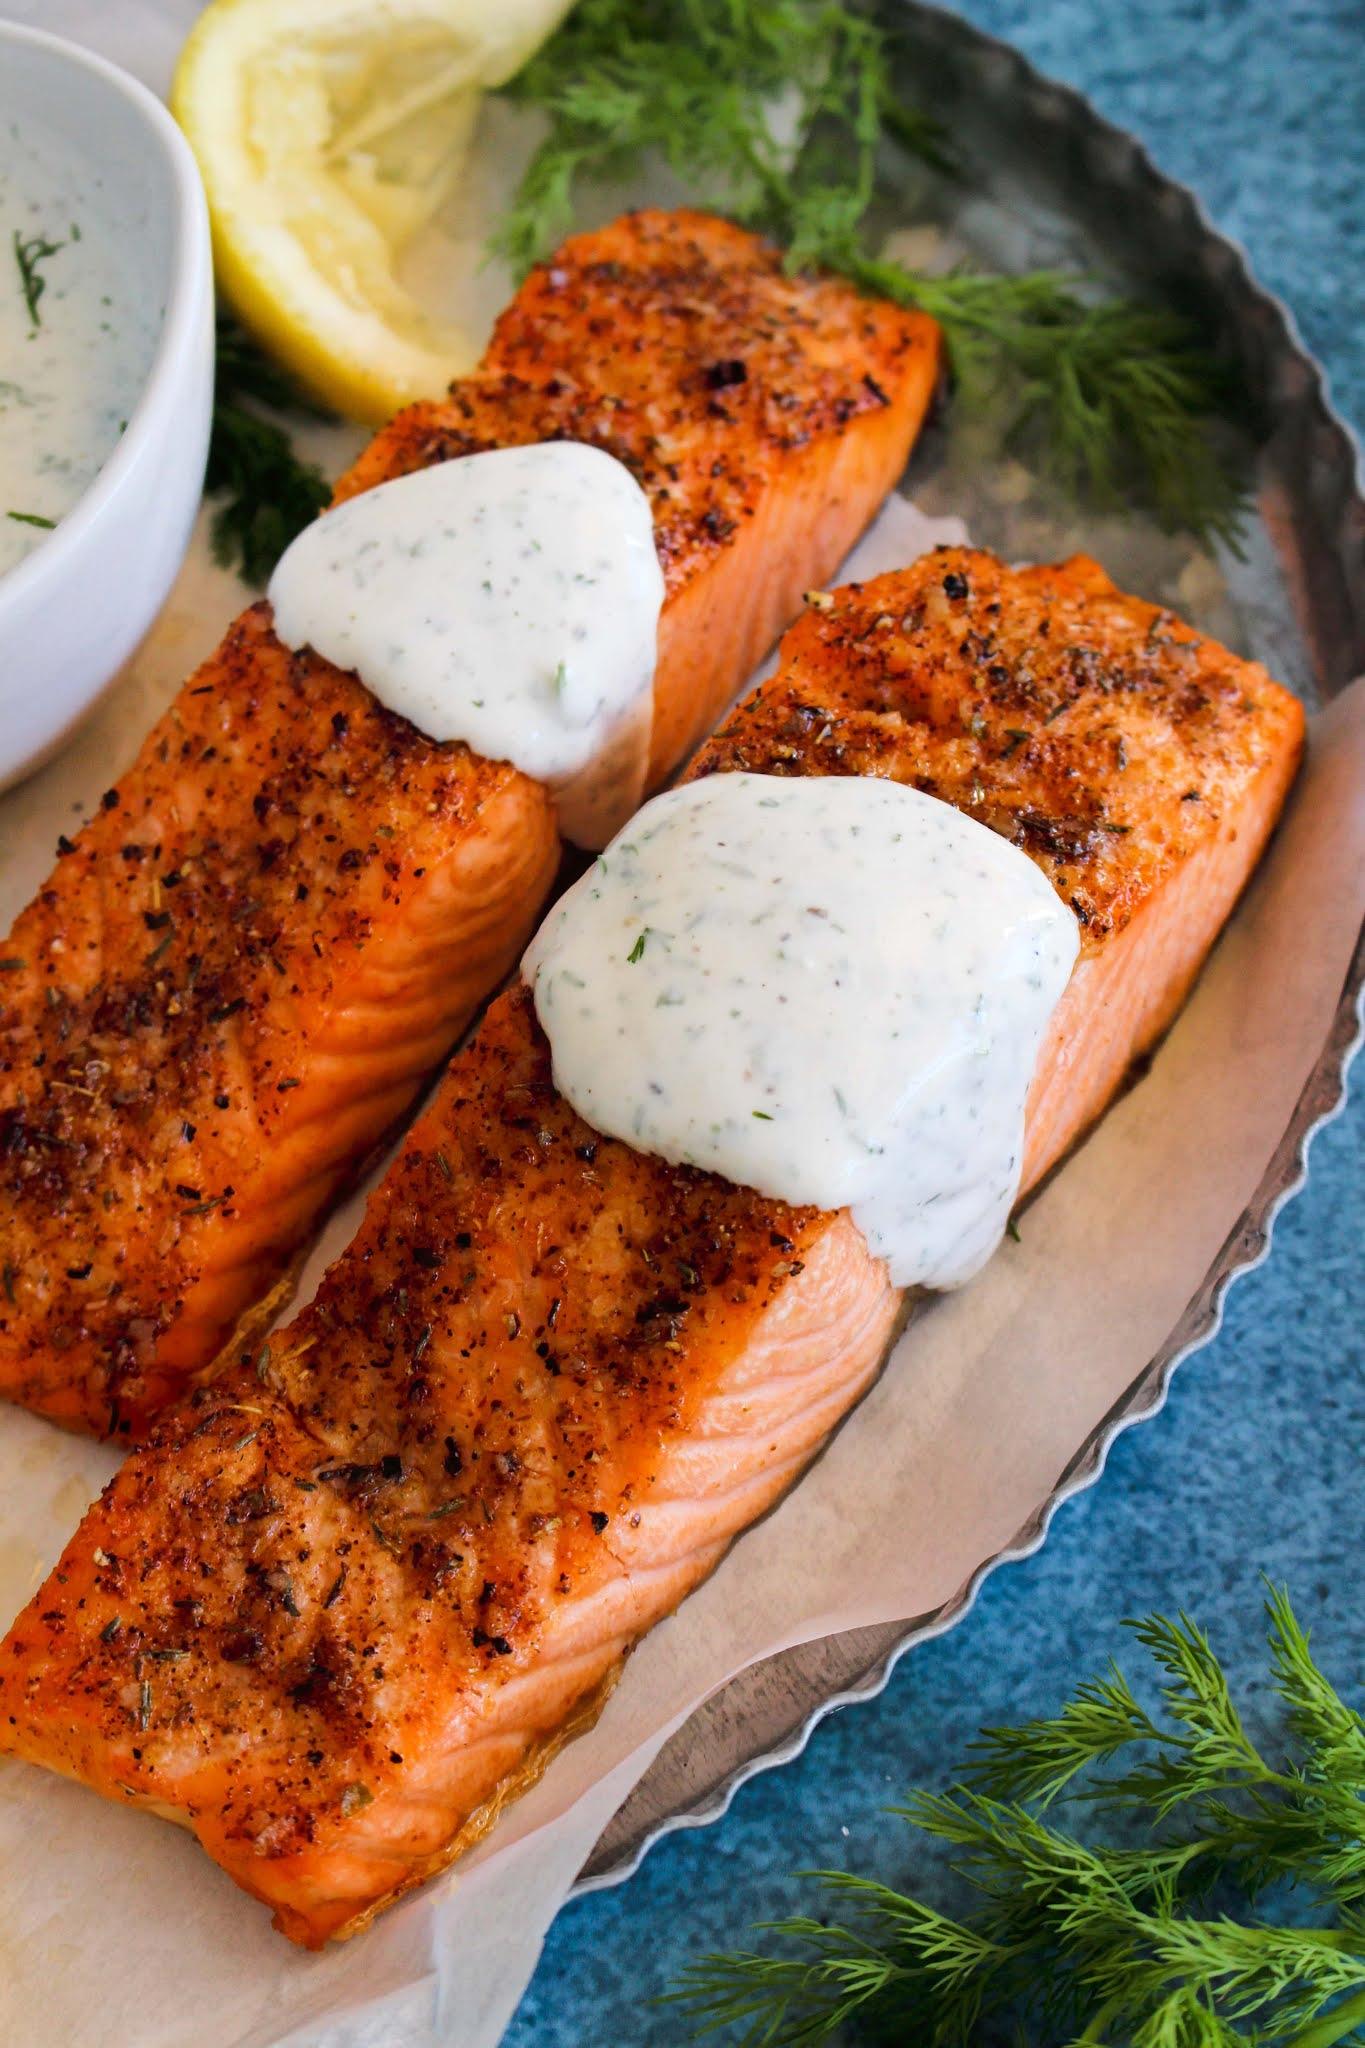 Lemon Dill Yogurt Sauce made with Greek yogurt and fresh dill is the perfect cool, creamy, fresh sauce to serve with your salmon! #salmon #dill #yogurt